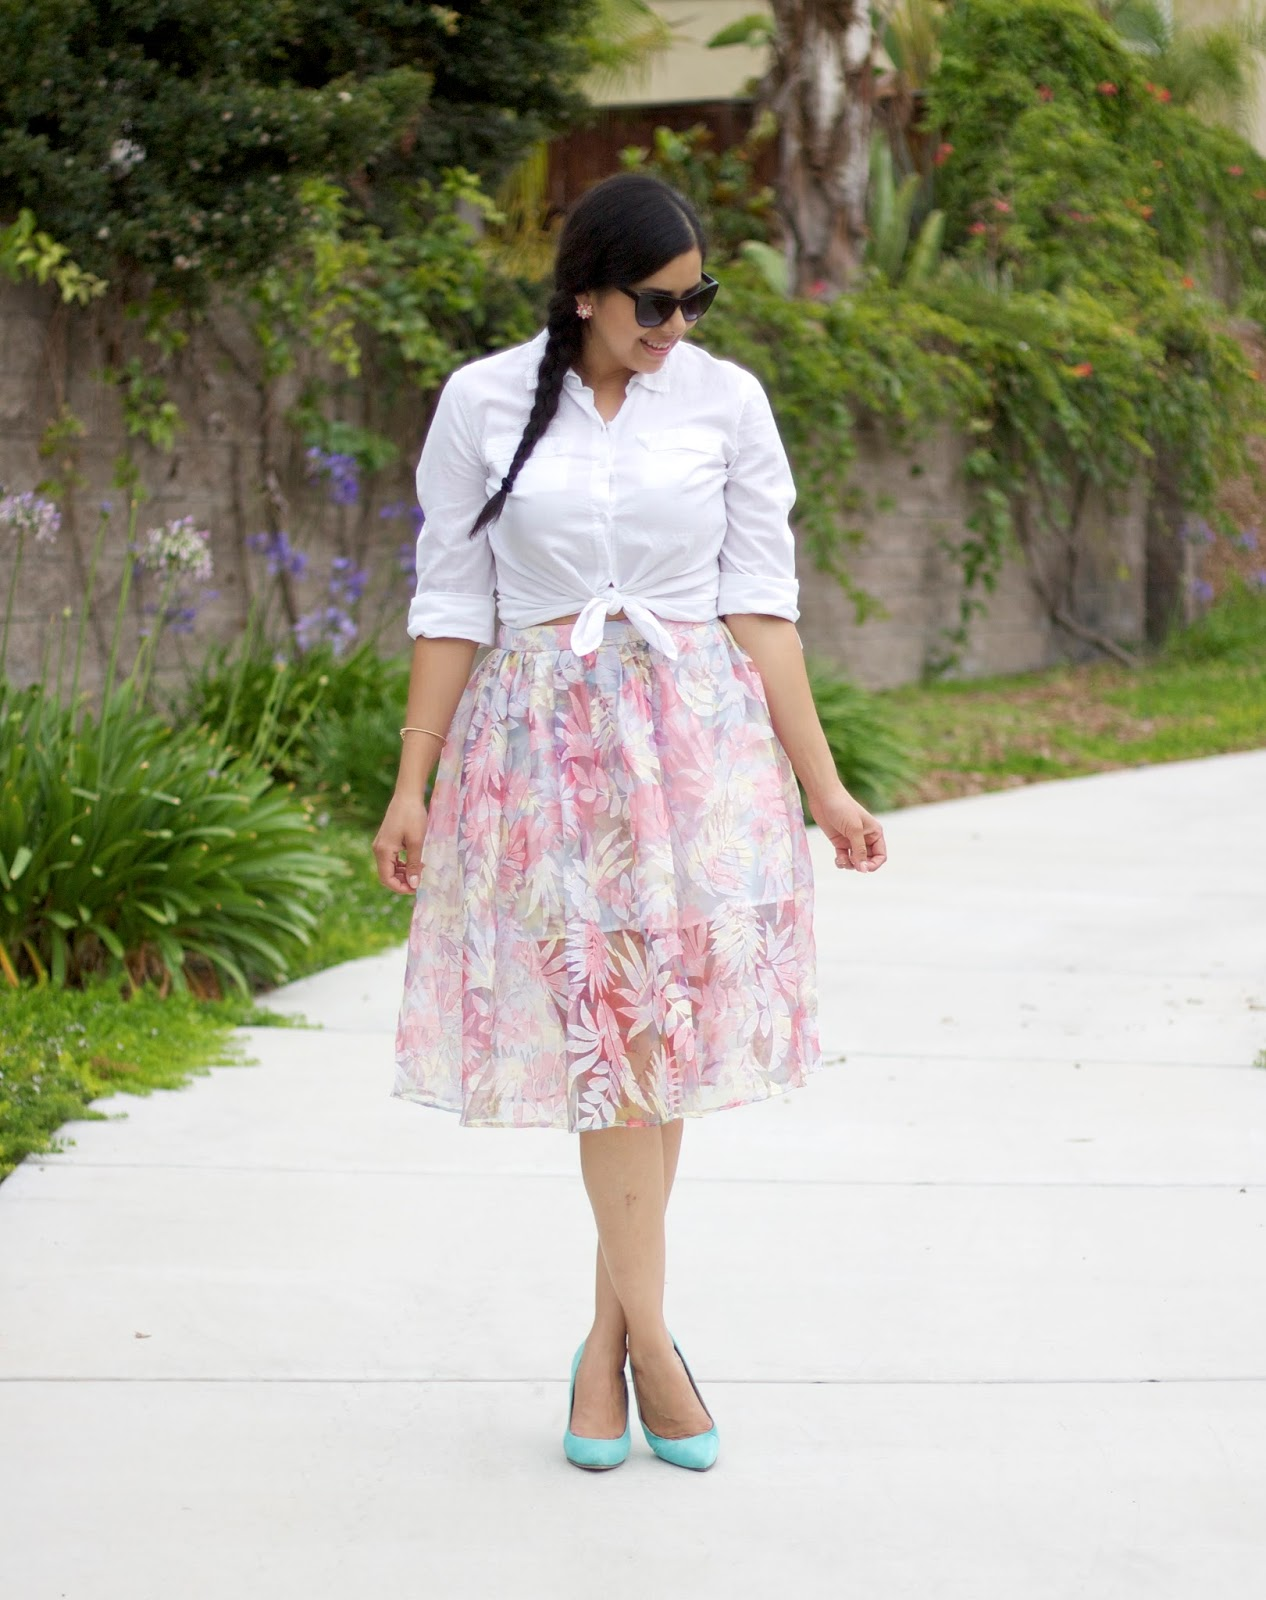 Organza pastel skirt, san diego fashion blogger, san diego style blogger, san diego style, i love san diego